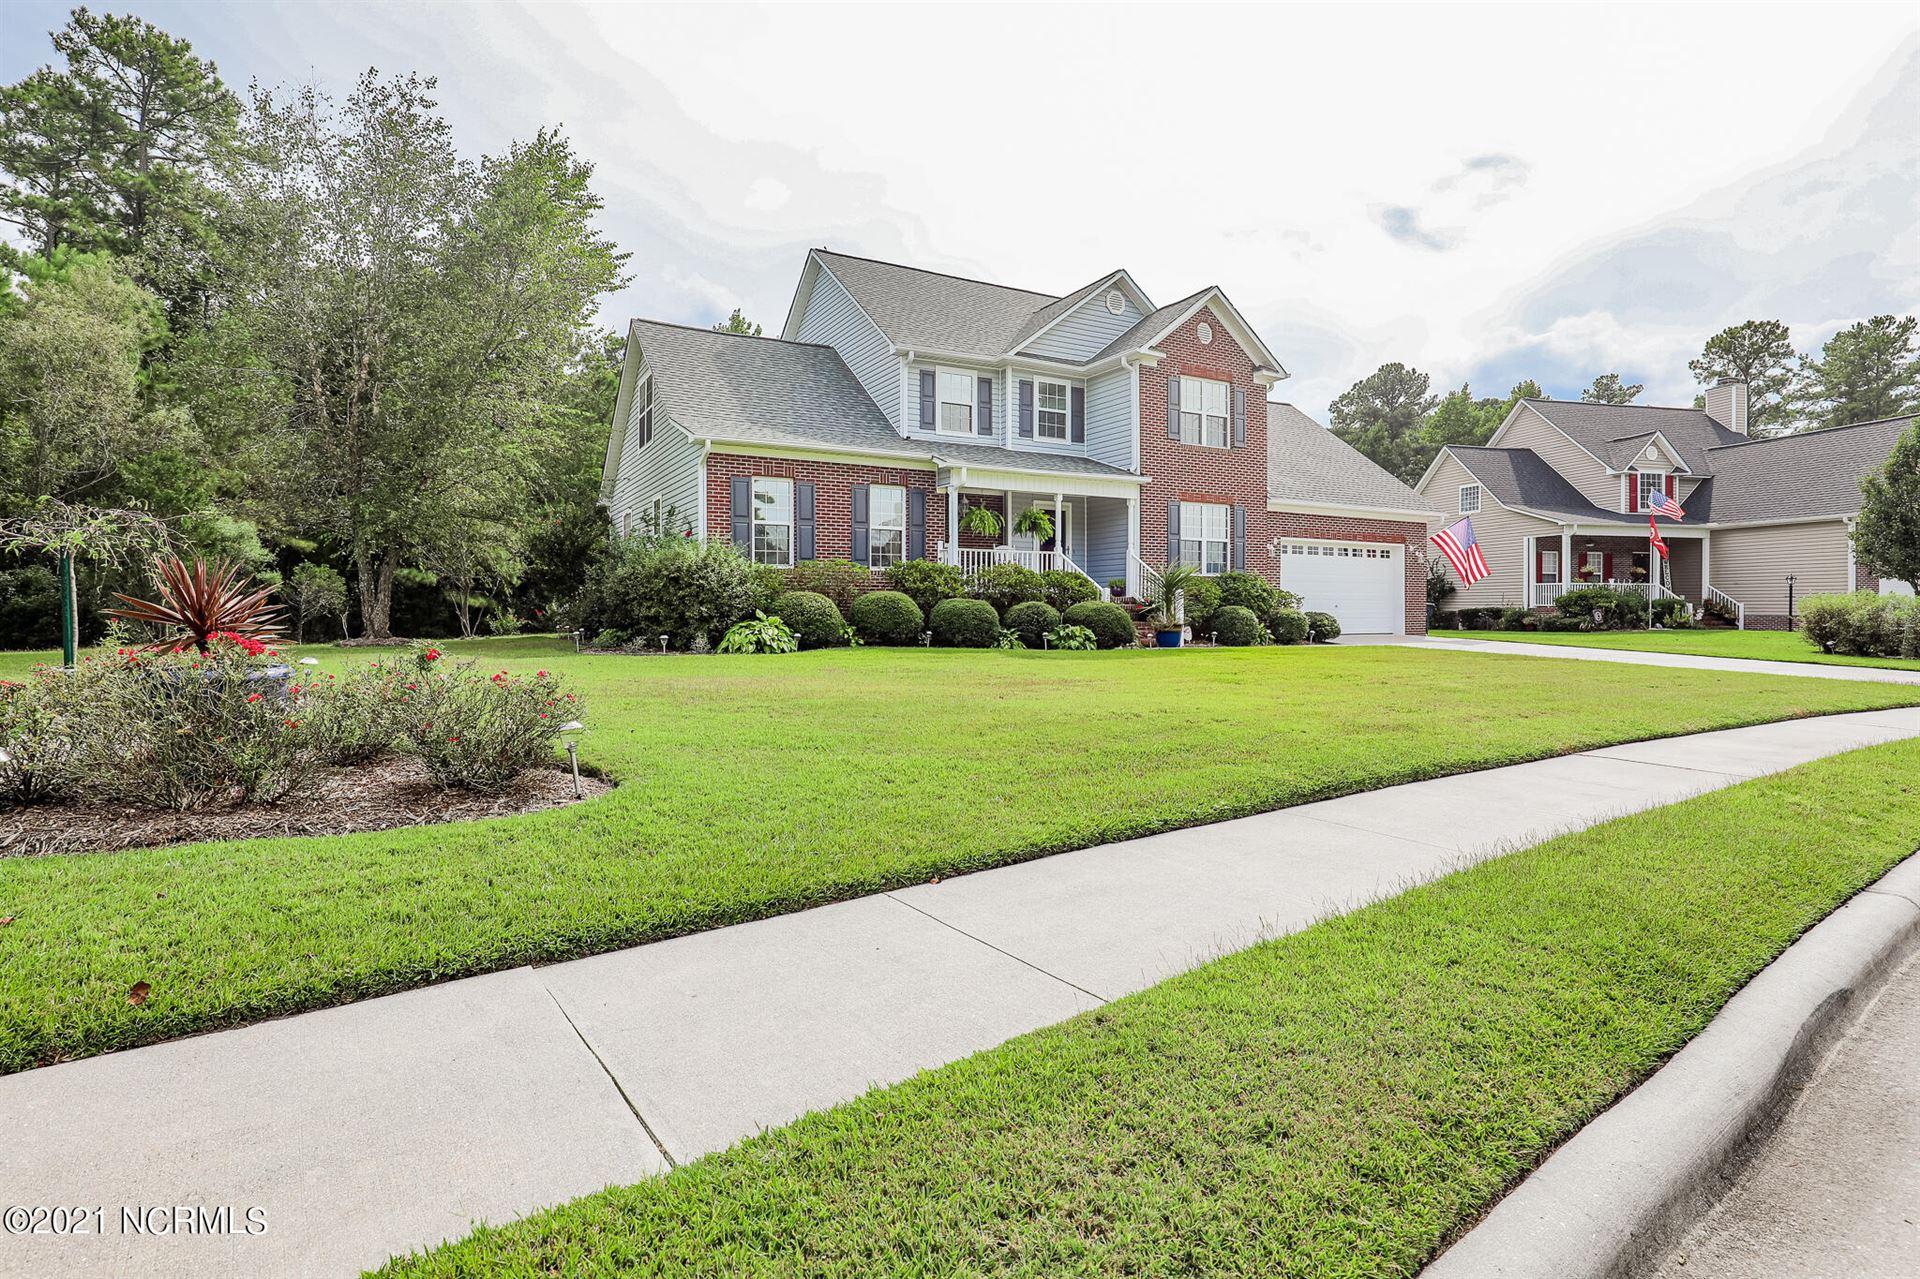 Photo of 203 Londonberry Lane, Jacksonville, NC 28540 (MLS # 100291577)